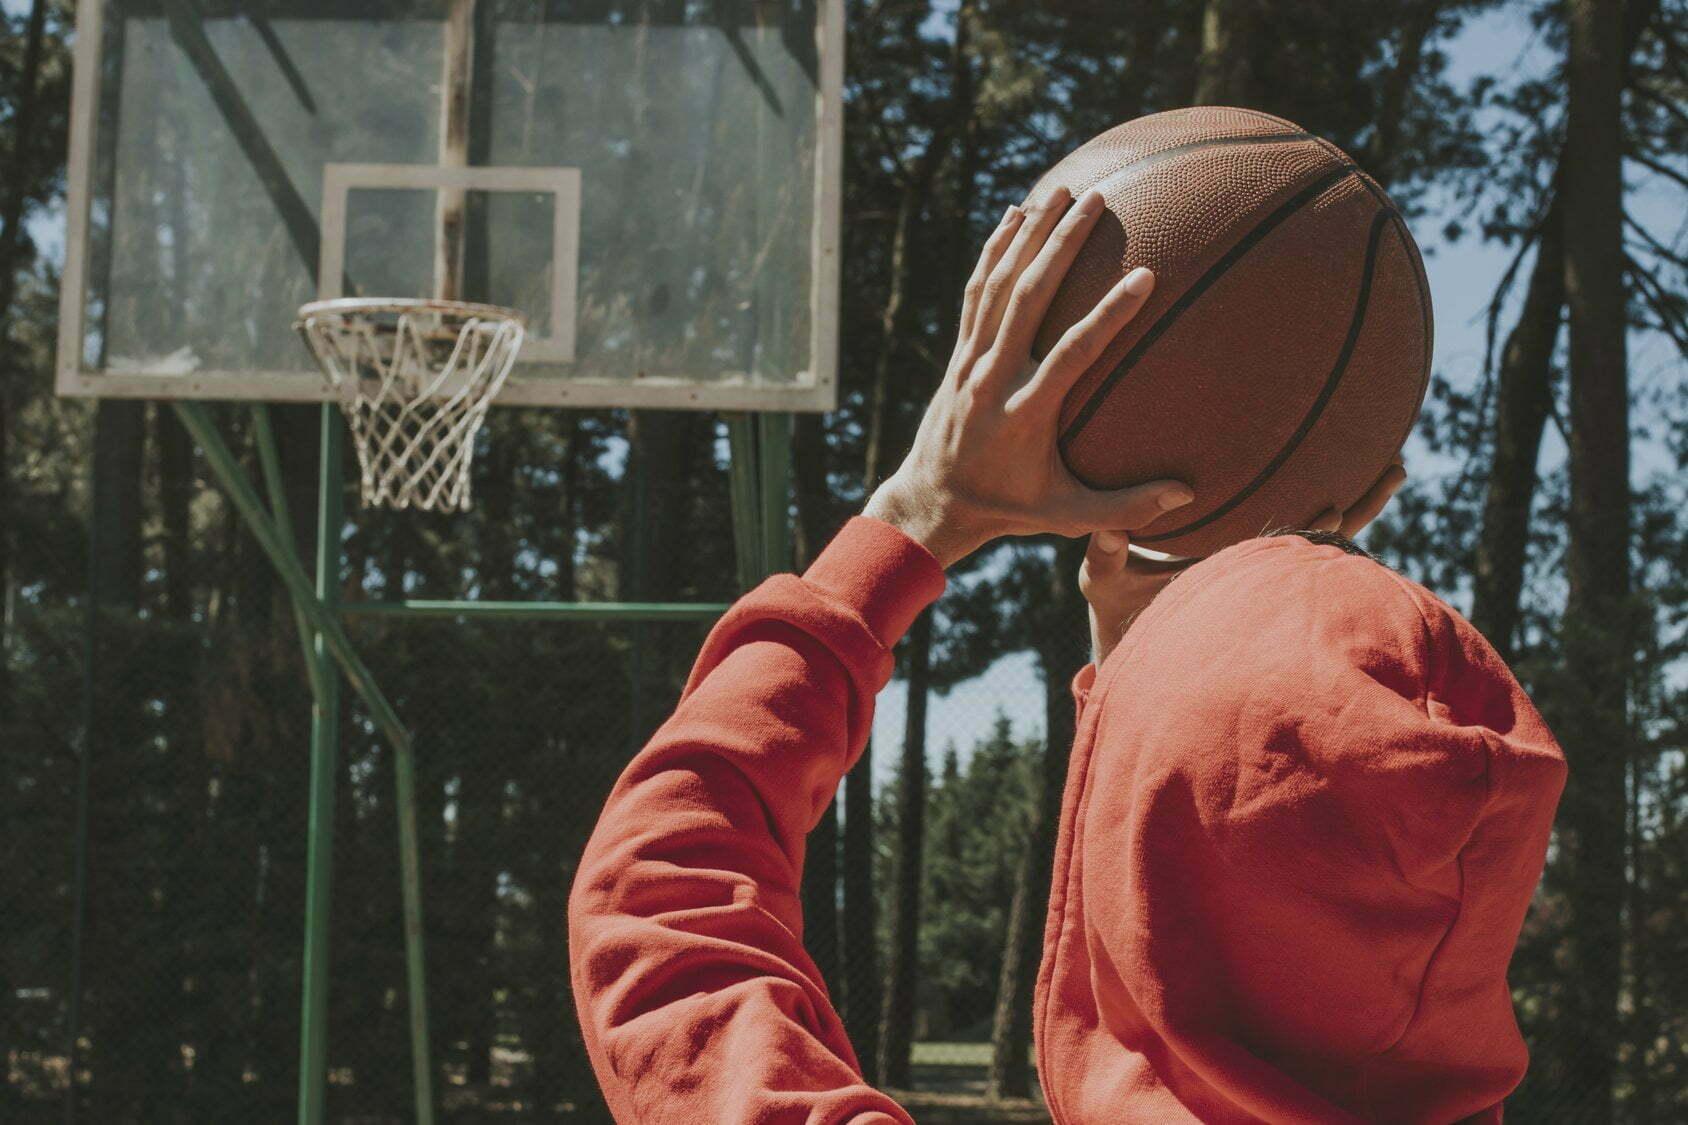 young man with basketball ball throwing basket